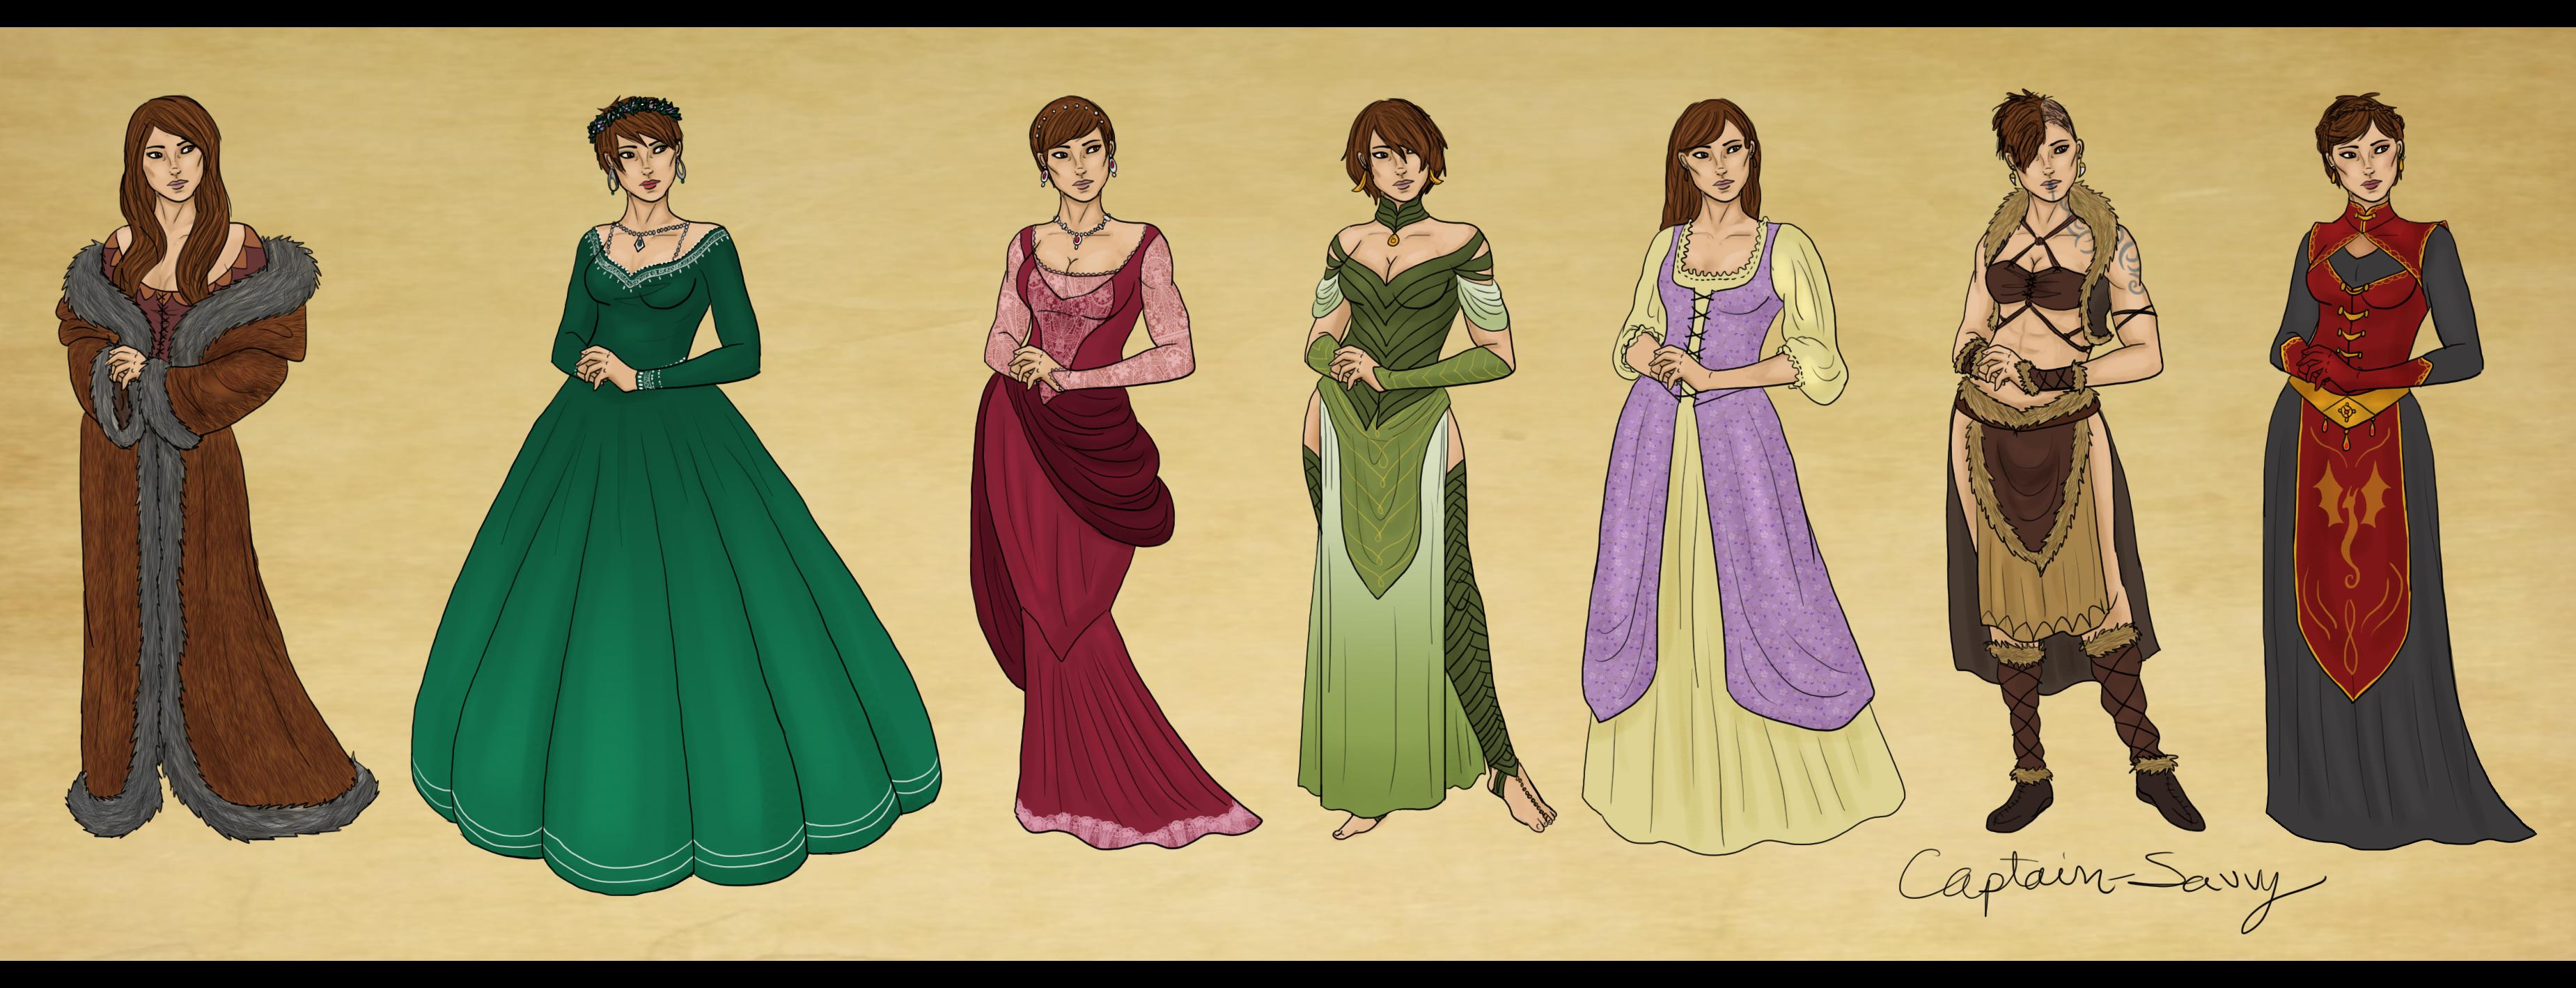 Alora Trevelyan Outfits